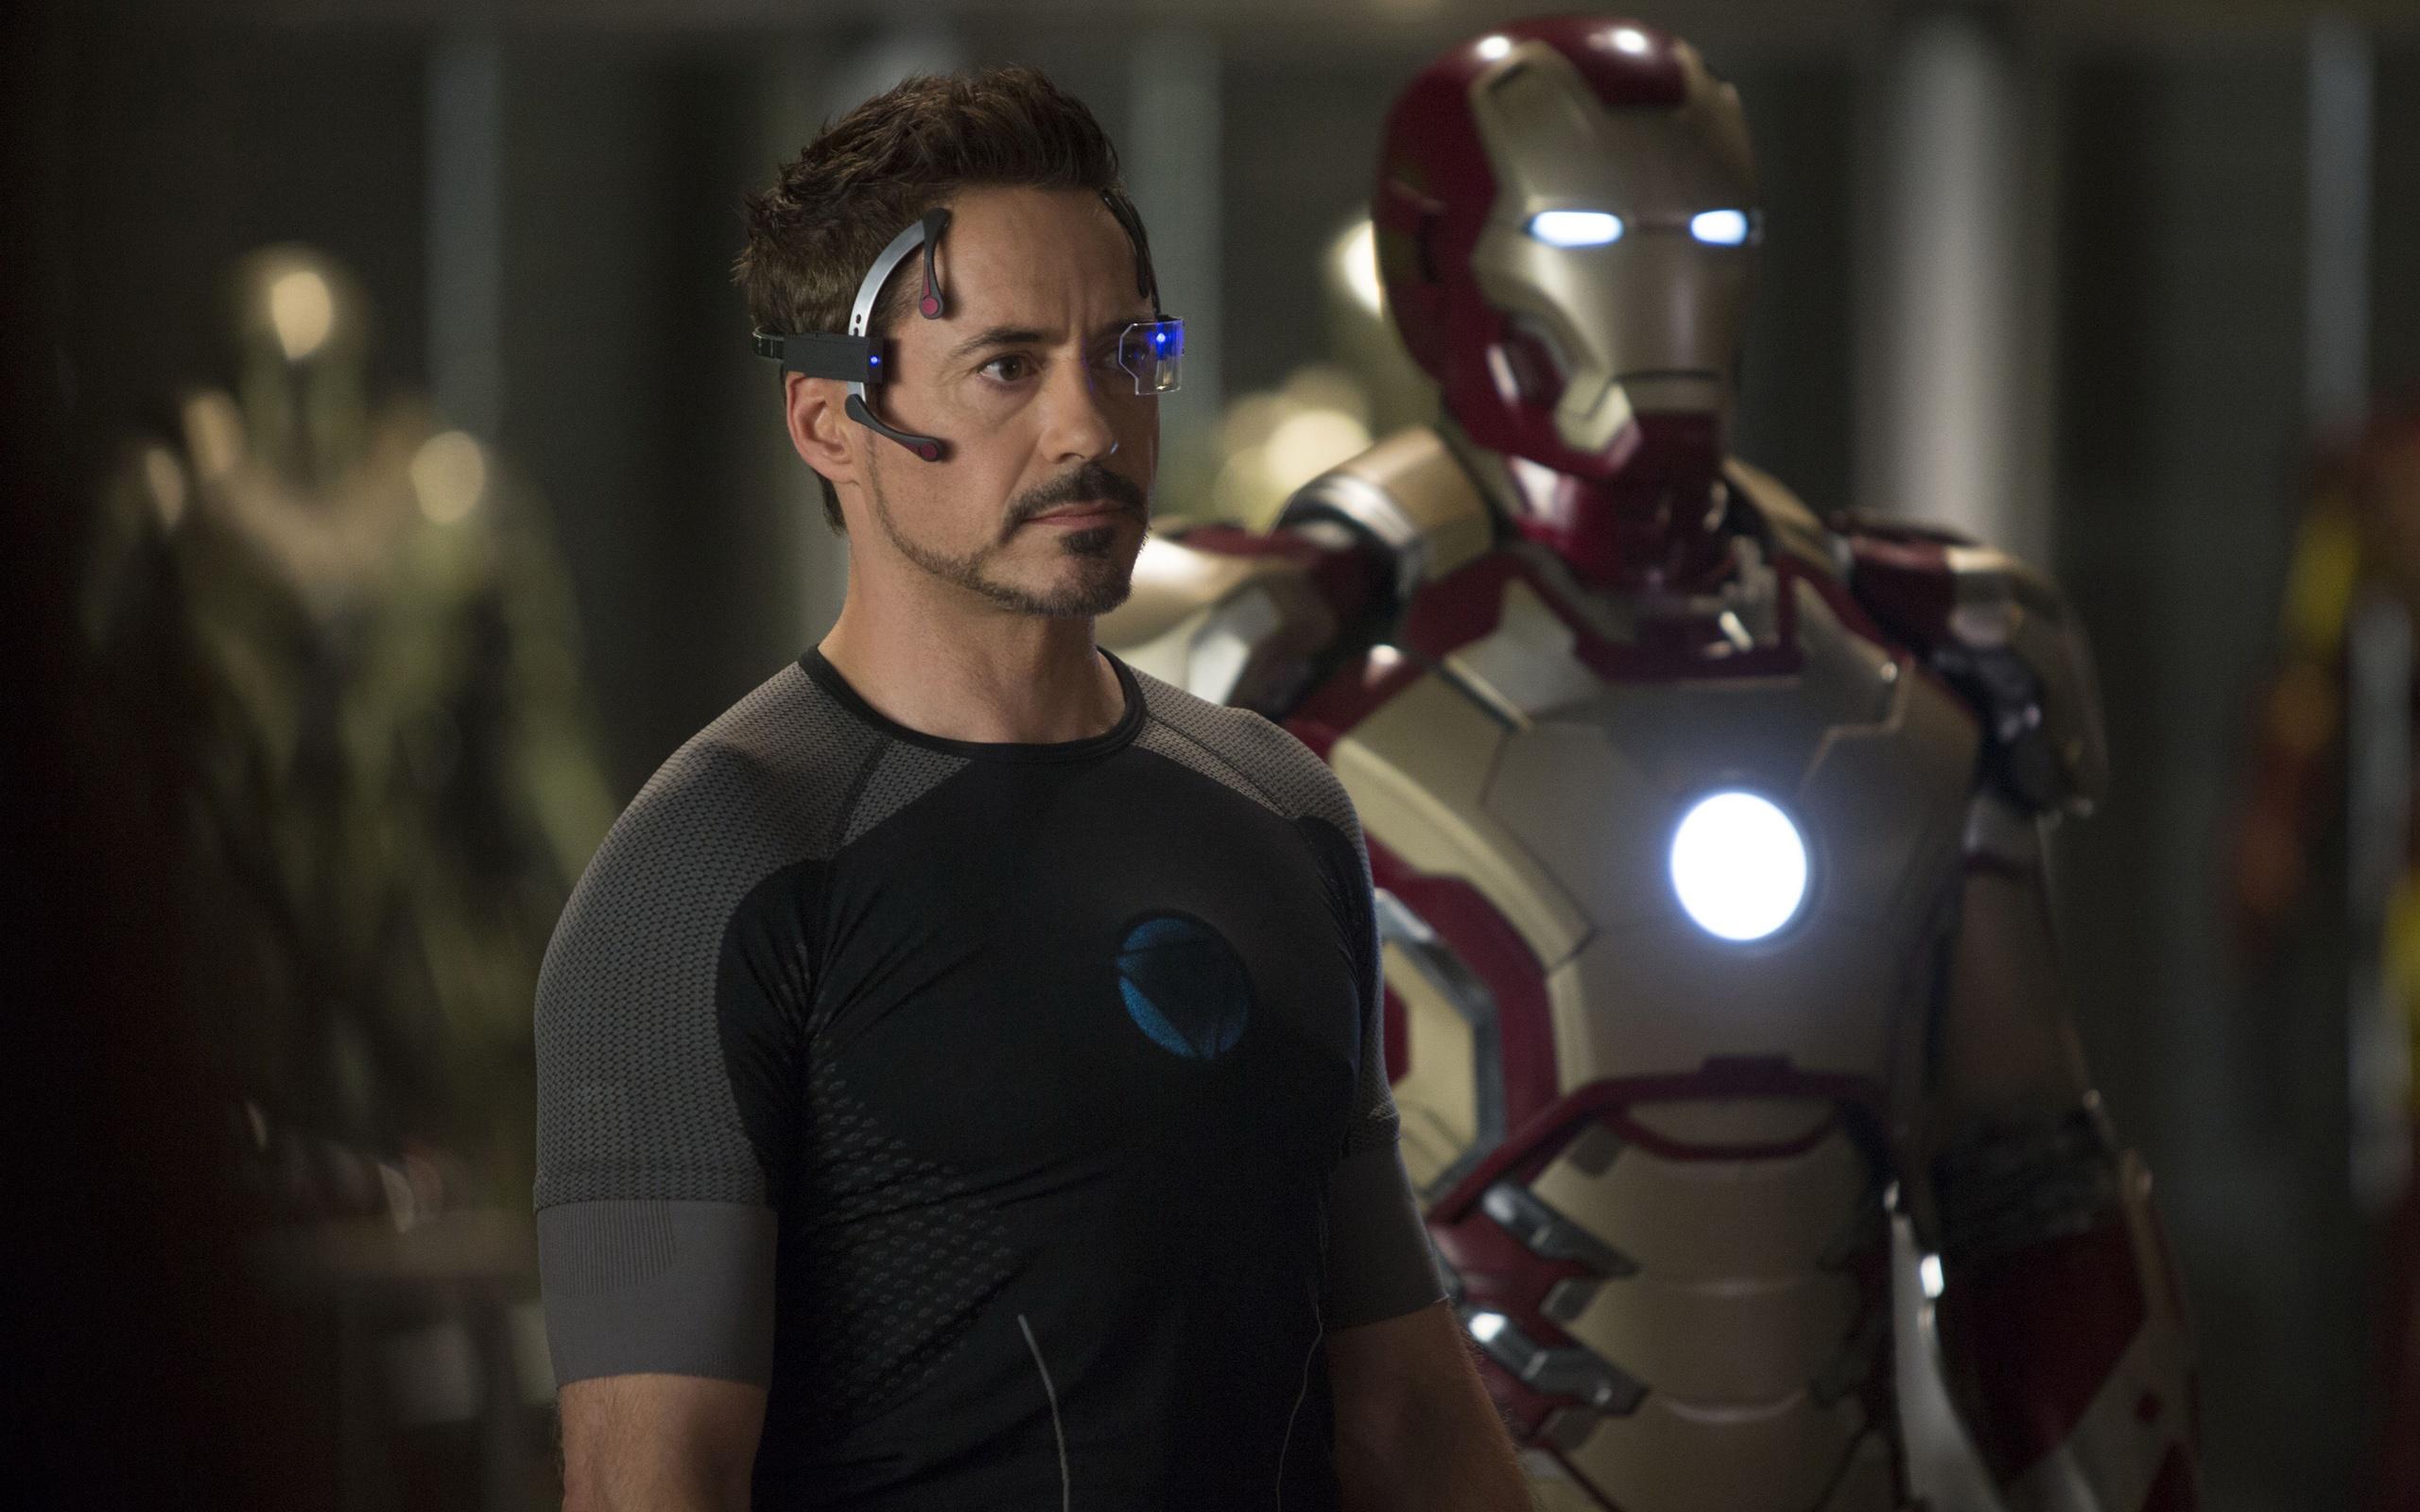 Wallpaper Robert Downey Jr In Iron Man 3 2560x1600 Hd Picture Image